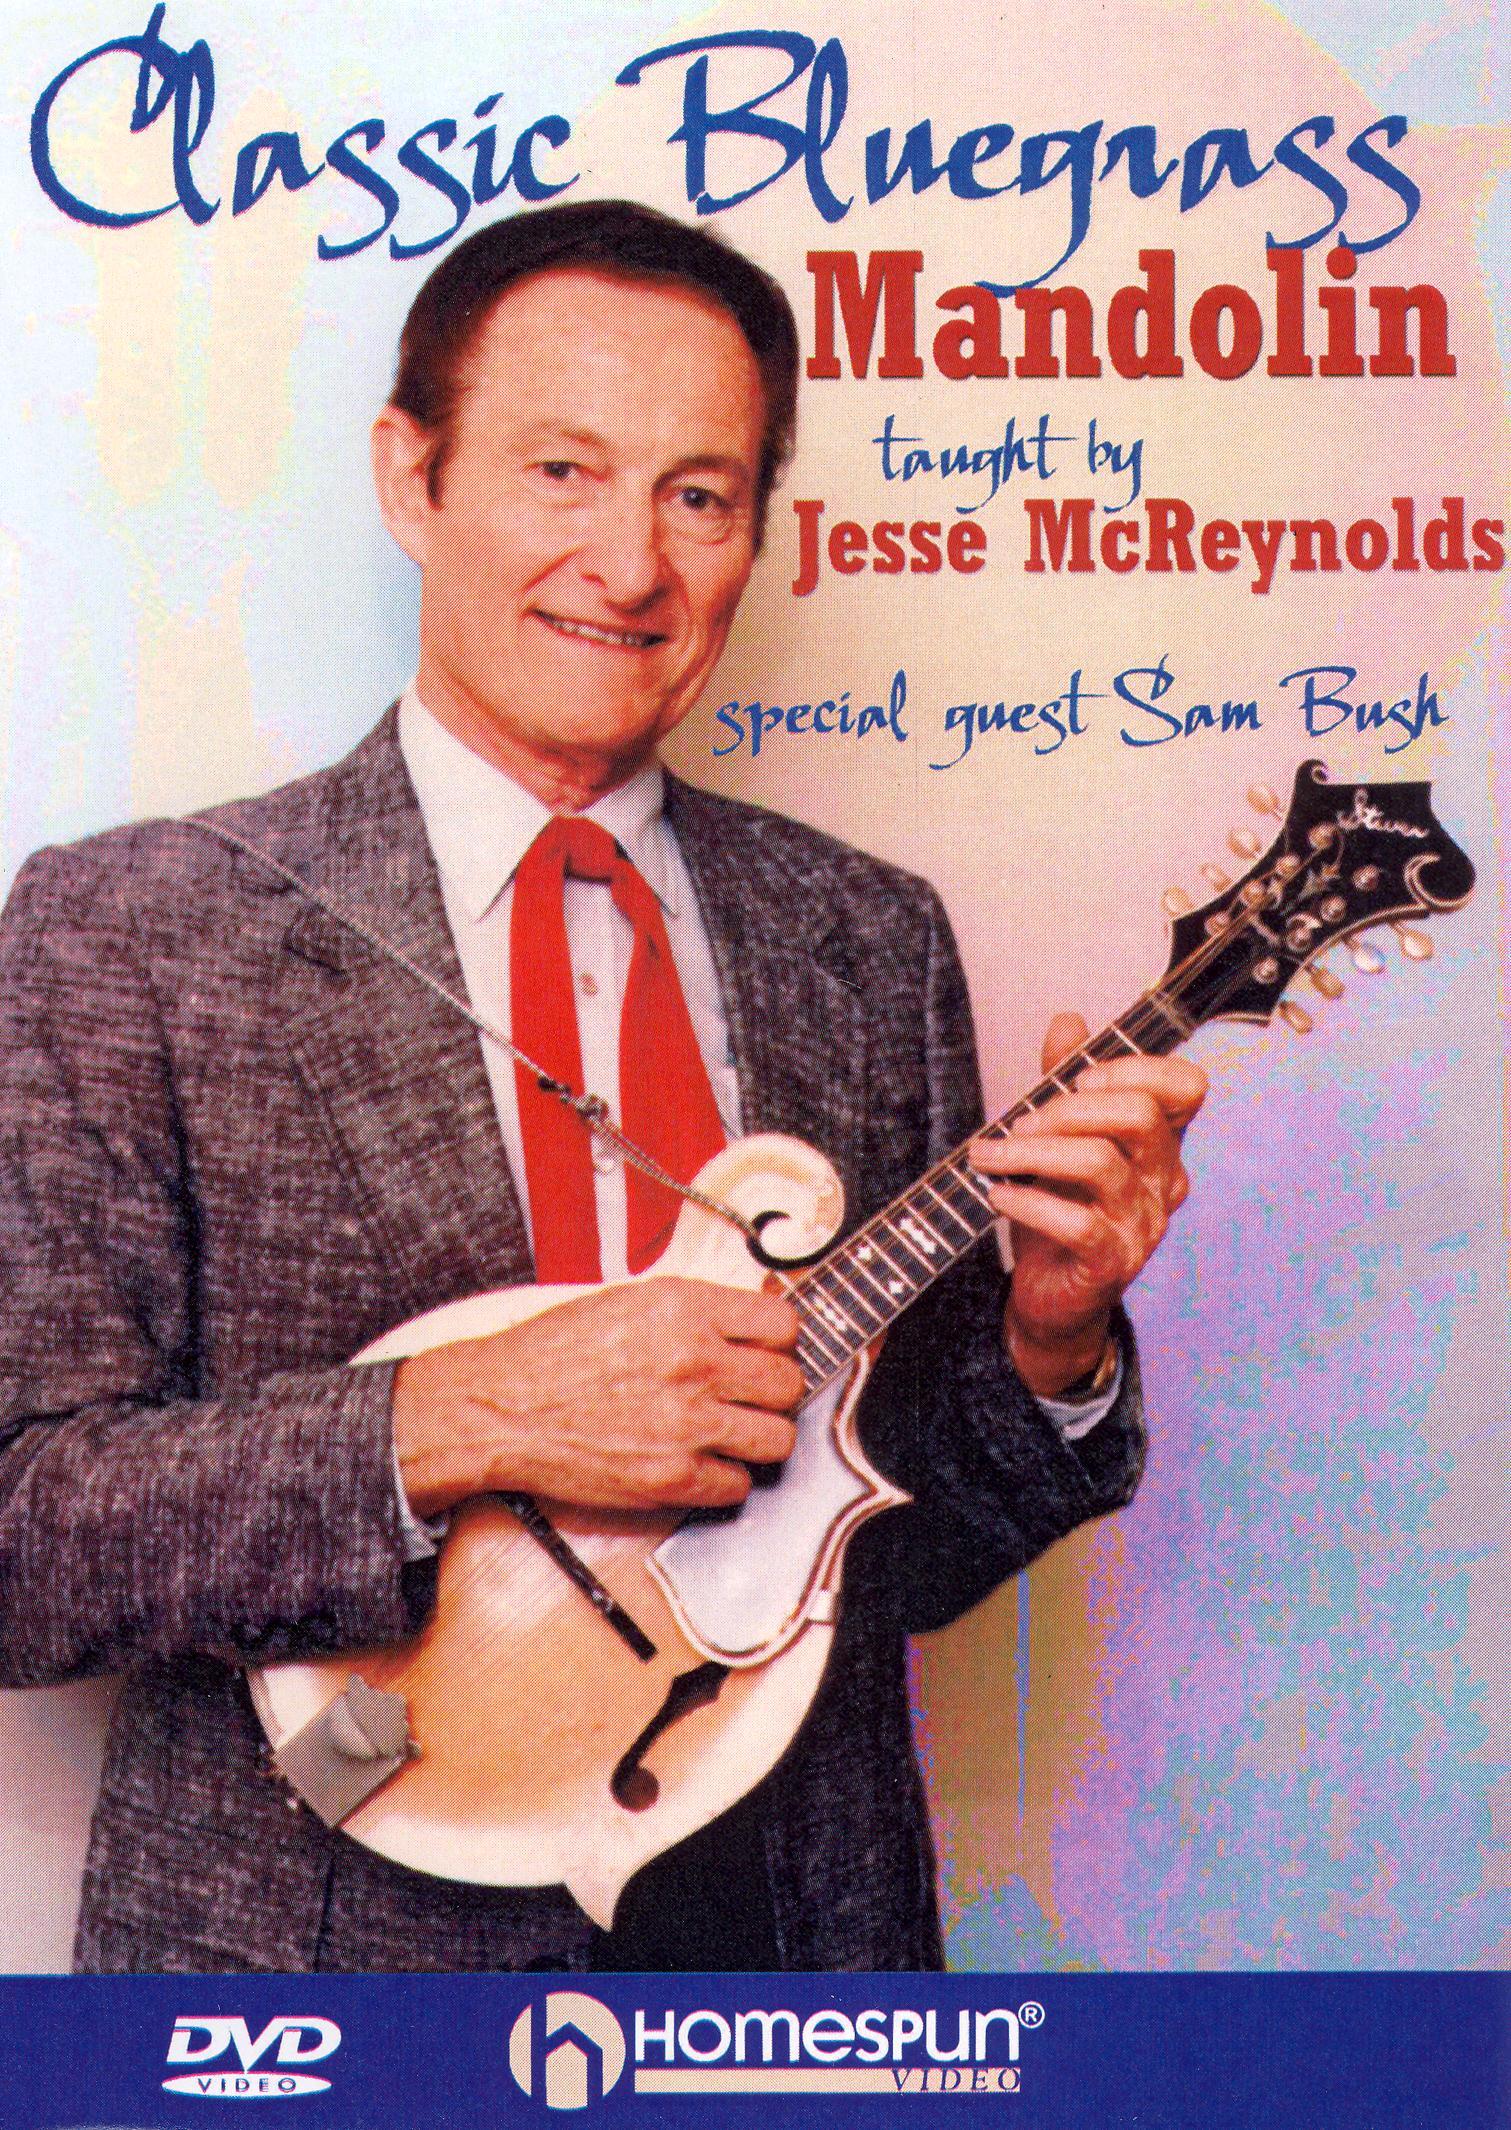 Jesse McReynolds: Classic Bluegrass Mandolin